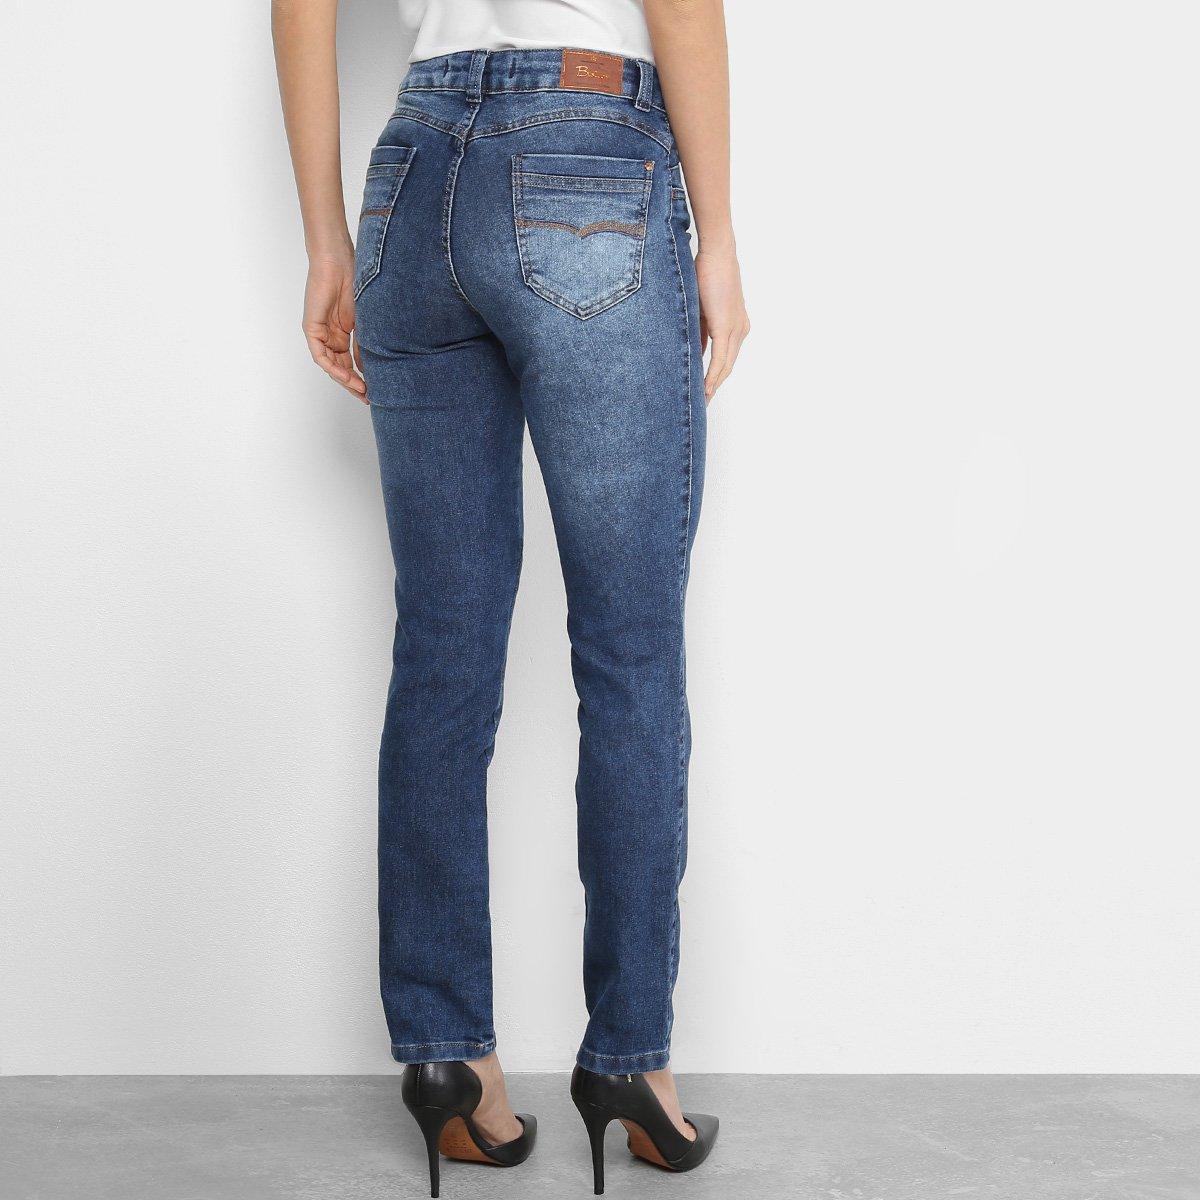 fab24c64f Calça Jeans Reta Biotipo Estonada Cintura Alta Feminina | Opte+